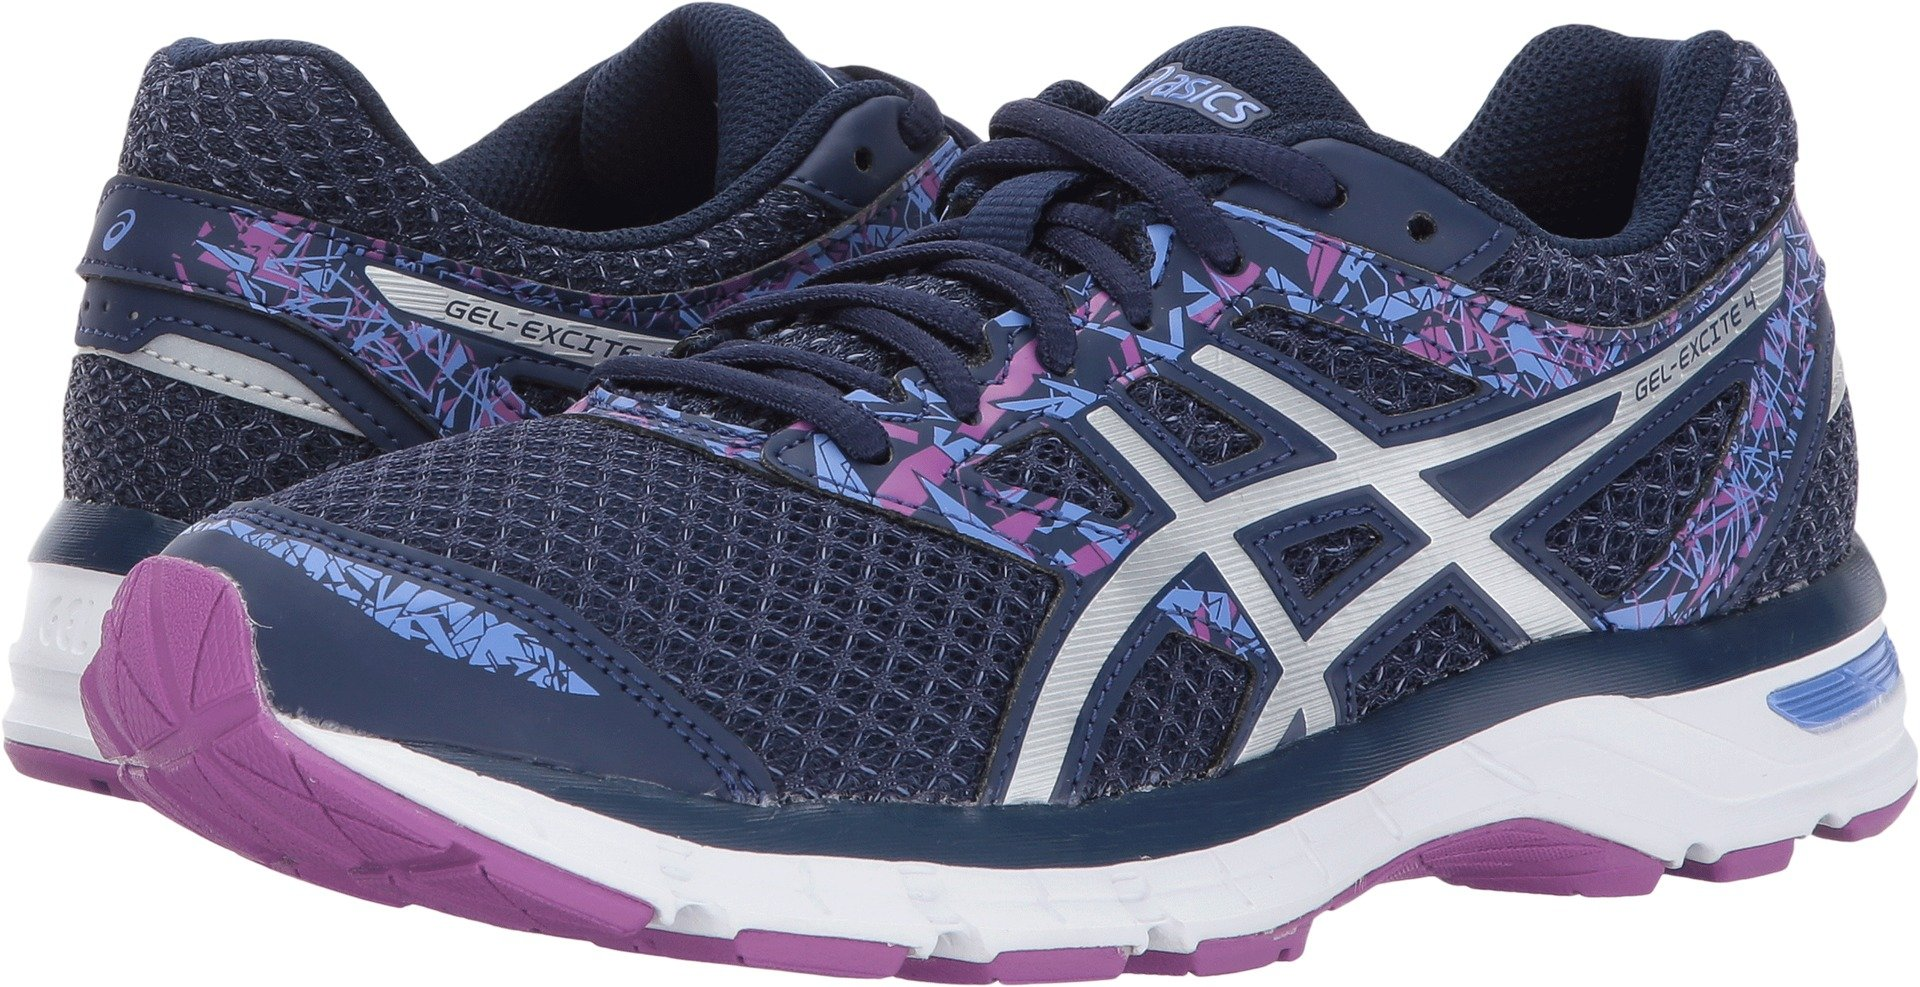 ASICS Women's Gel-Excite 4 Indigo Blue/Blue/Orchid Athletic Shoe 8 M US